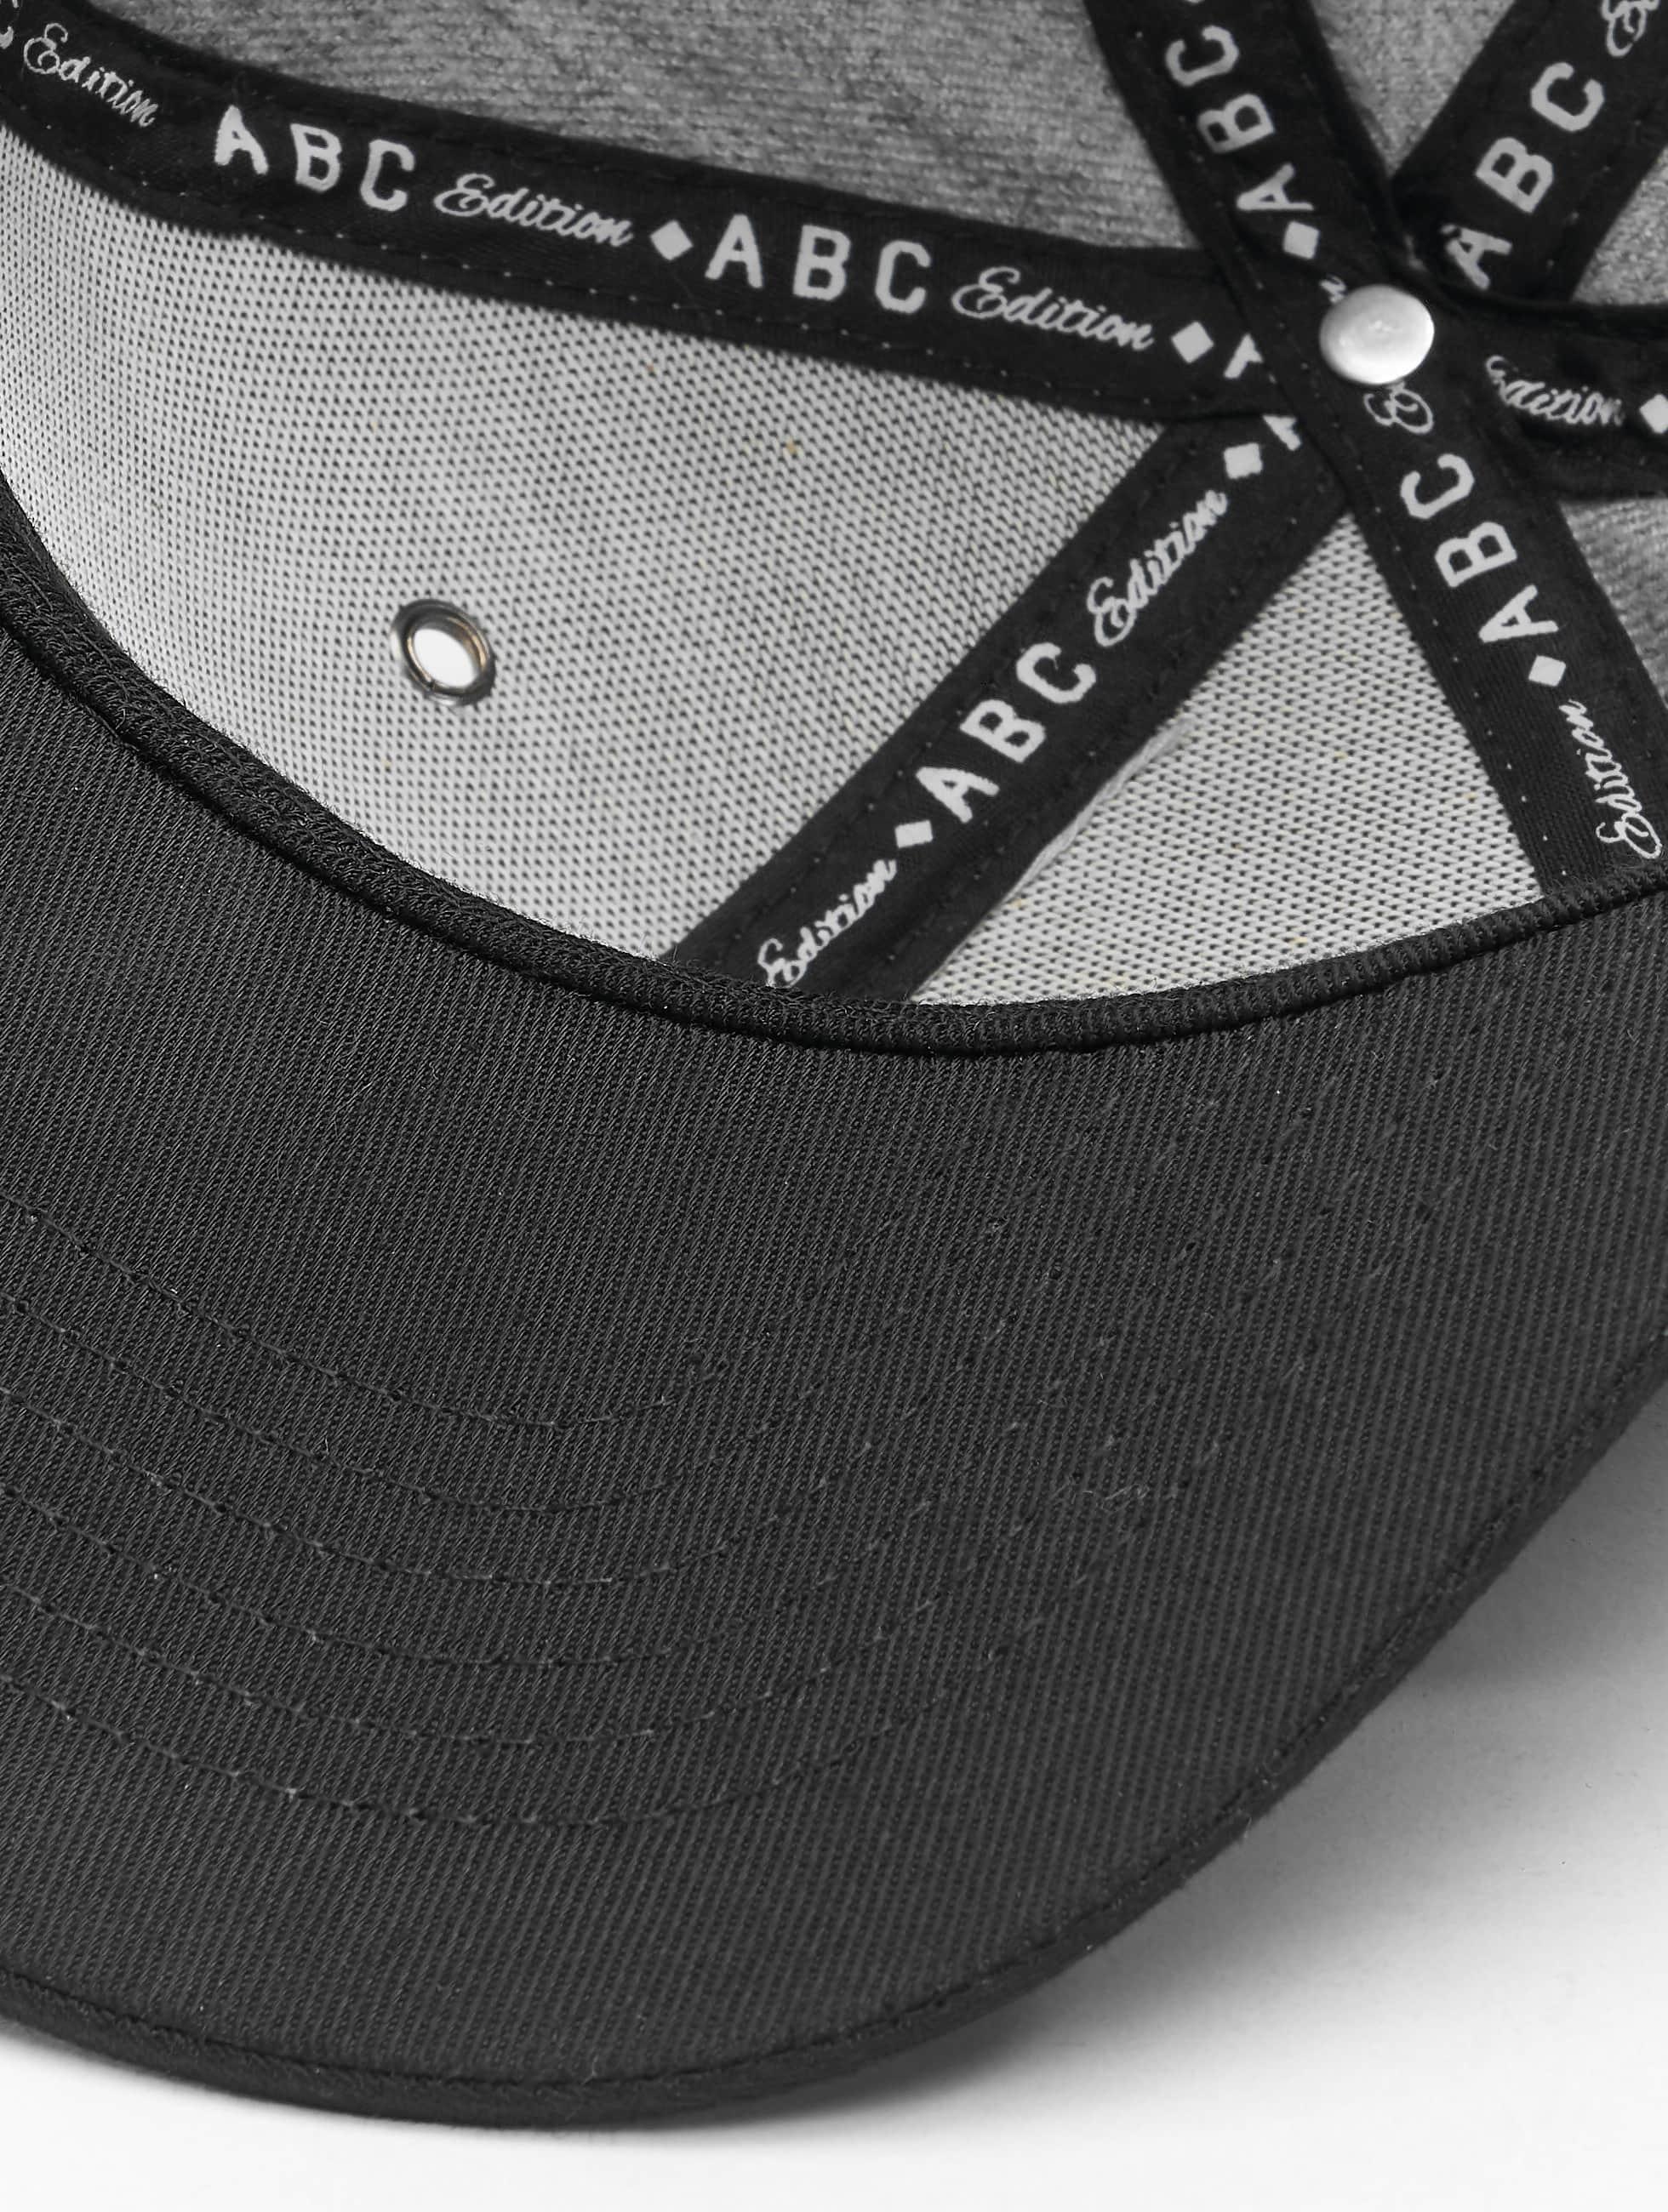 TrueSpin Кепка с застёжкой ABC-U Wool серый